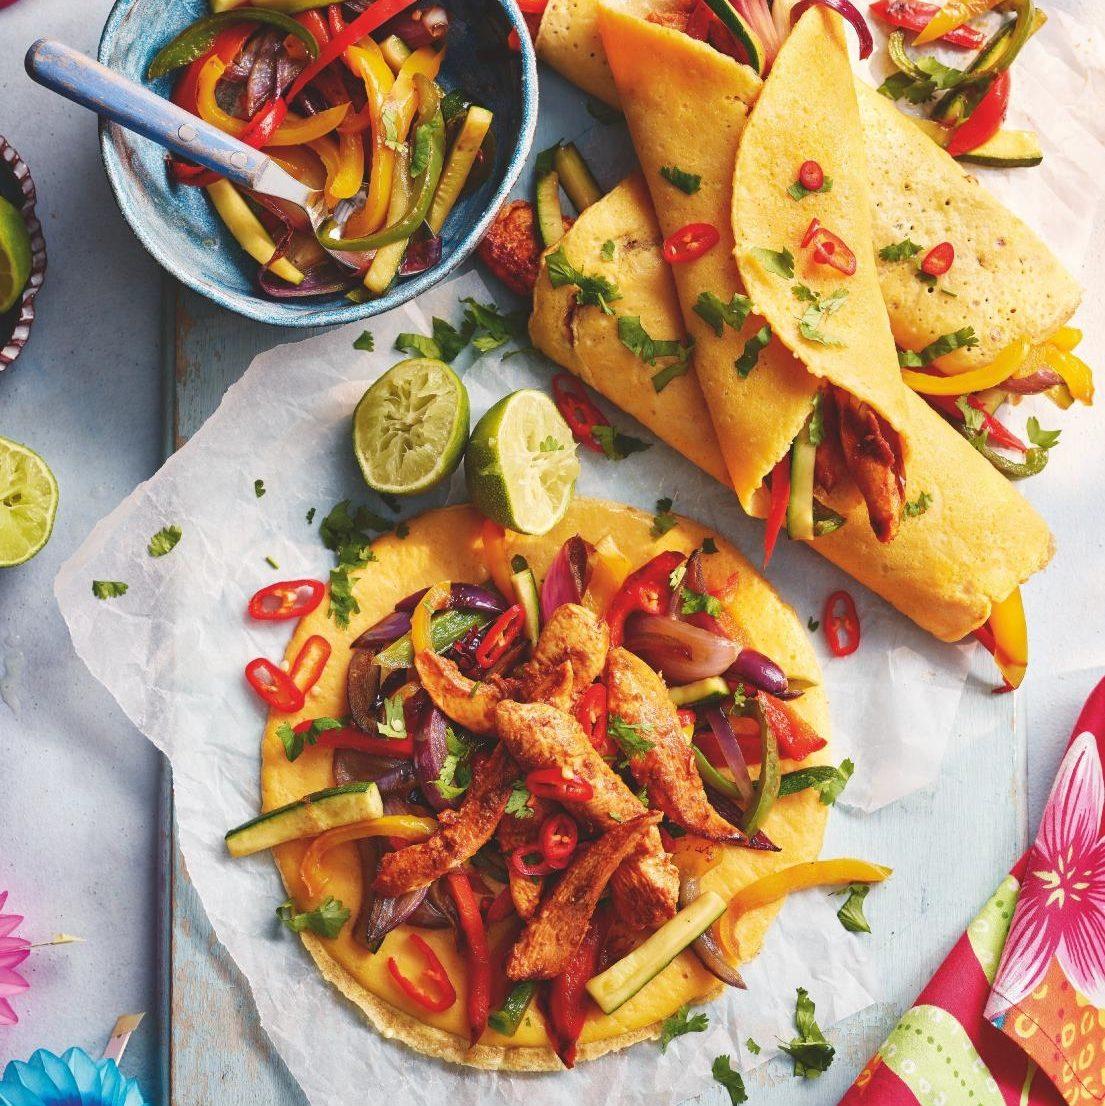 SW recipe: Chicken and vegetable fajitas